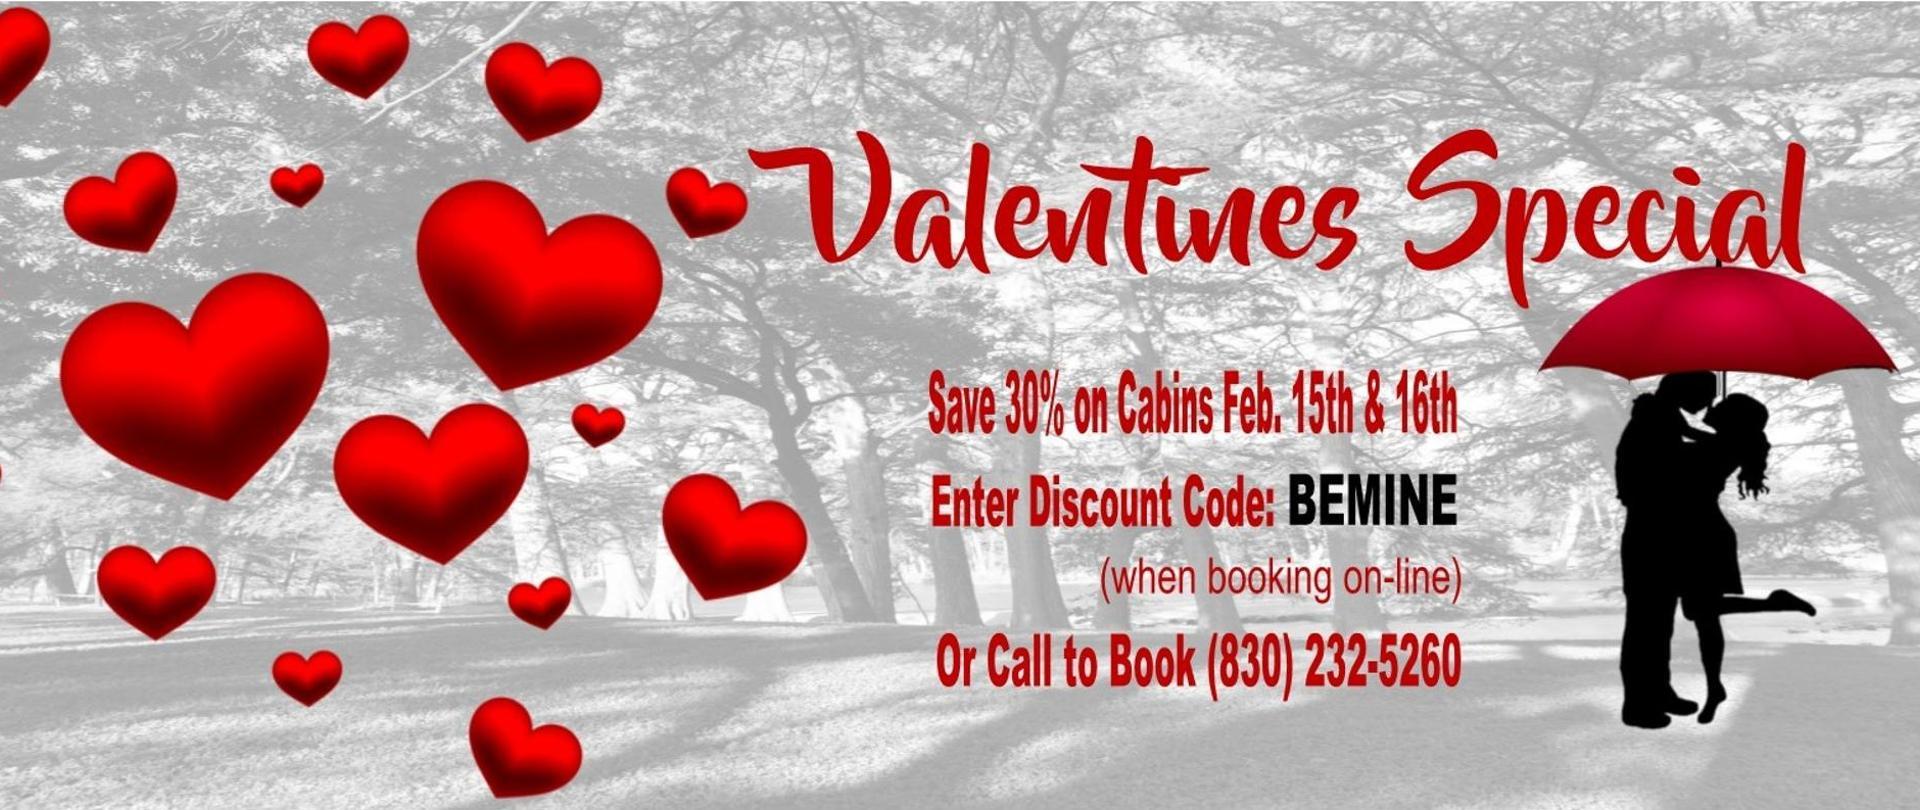 Valentines day special 2019.jpg